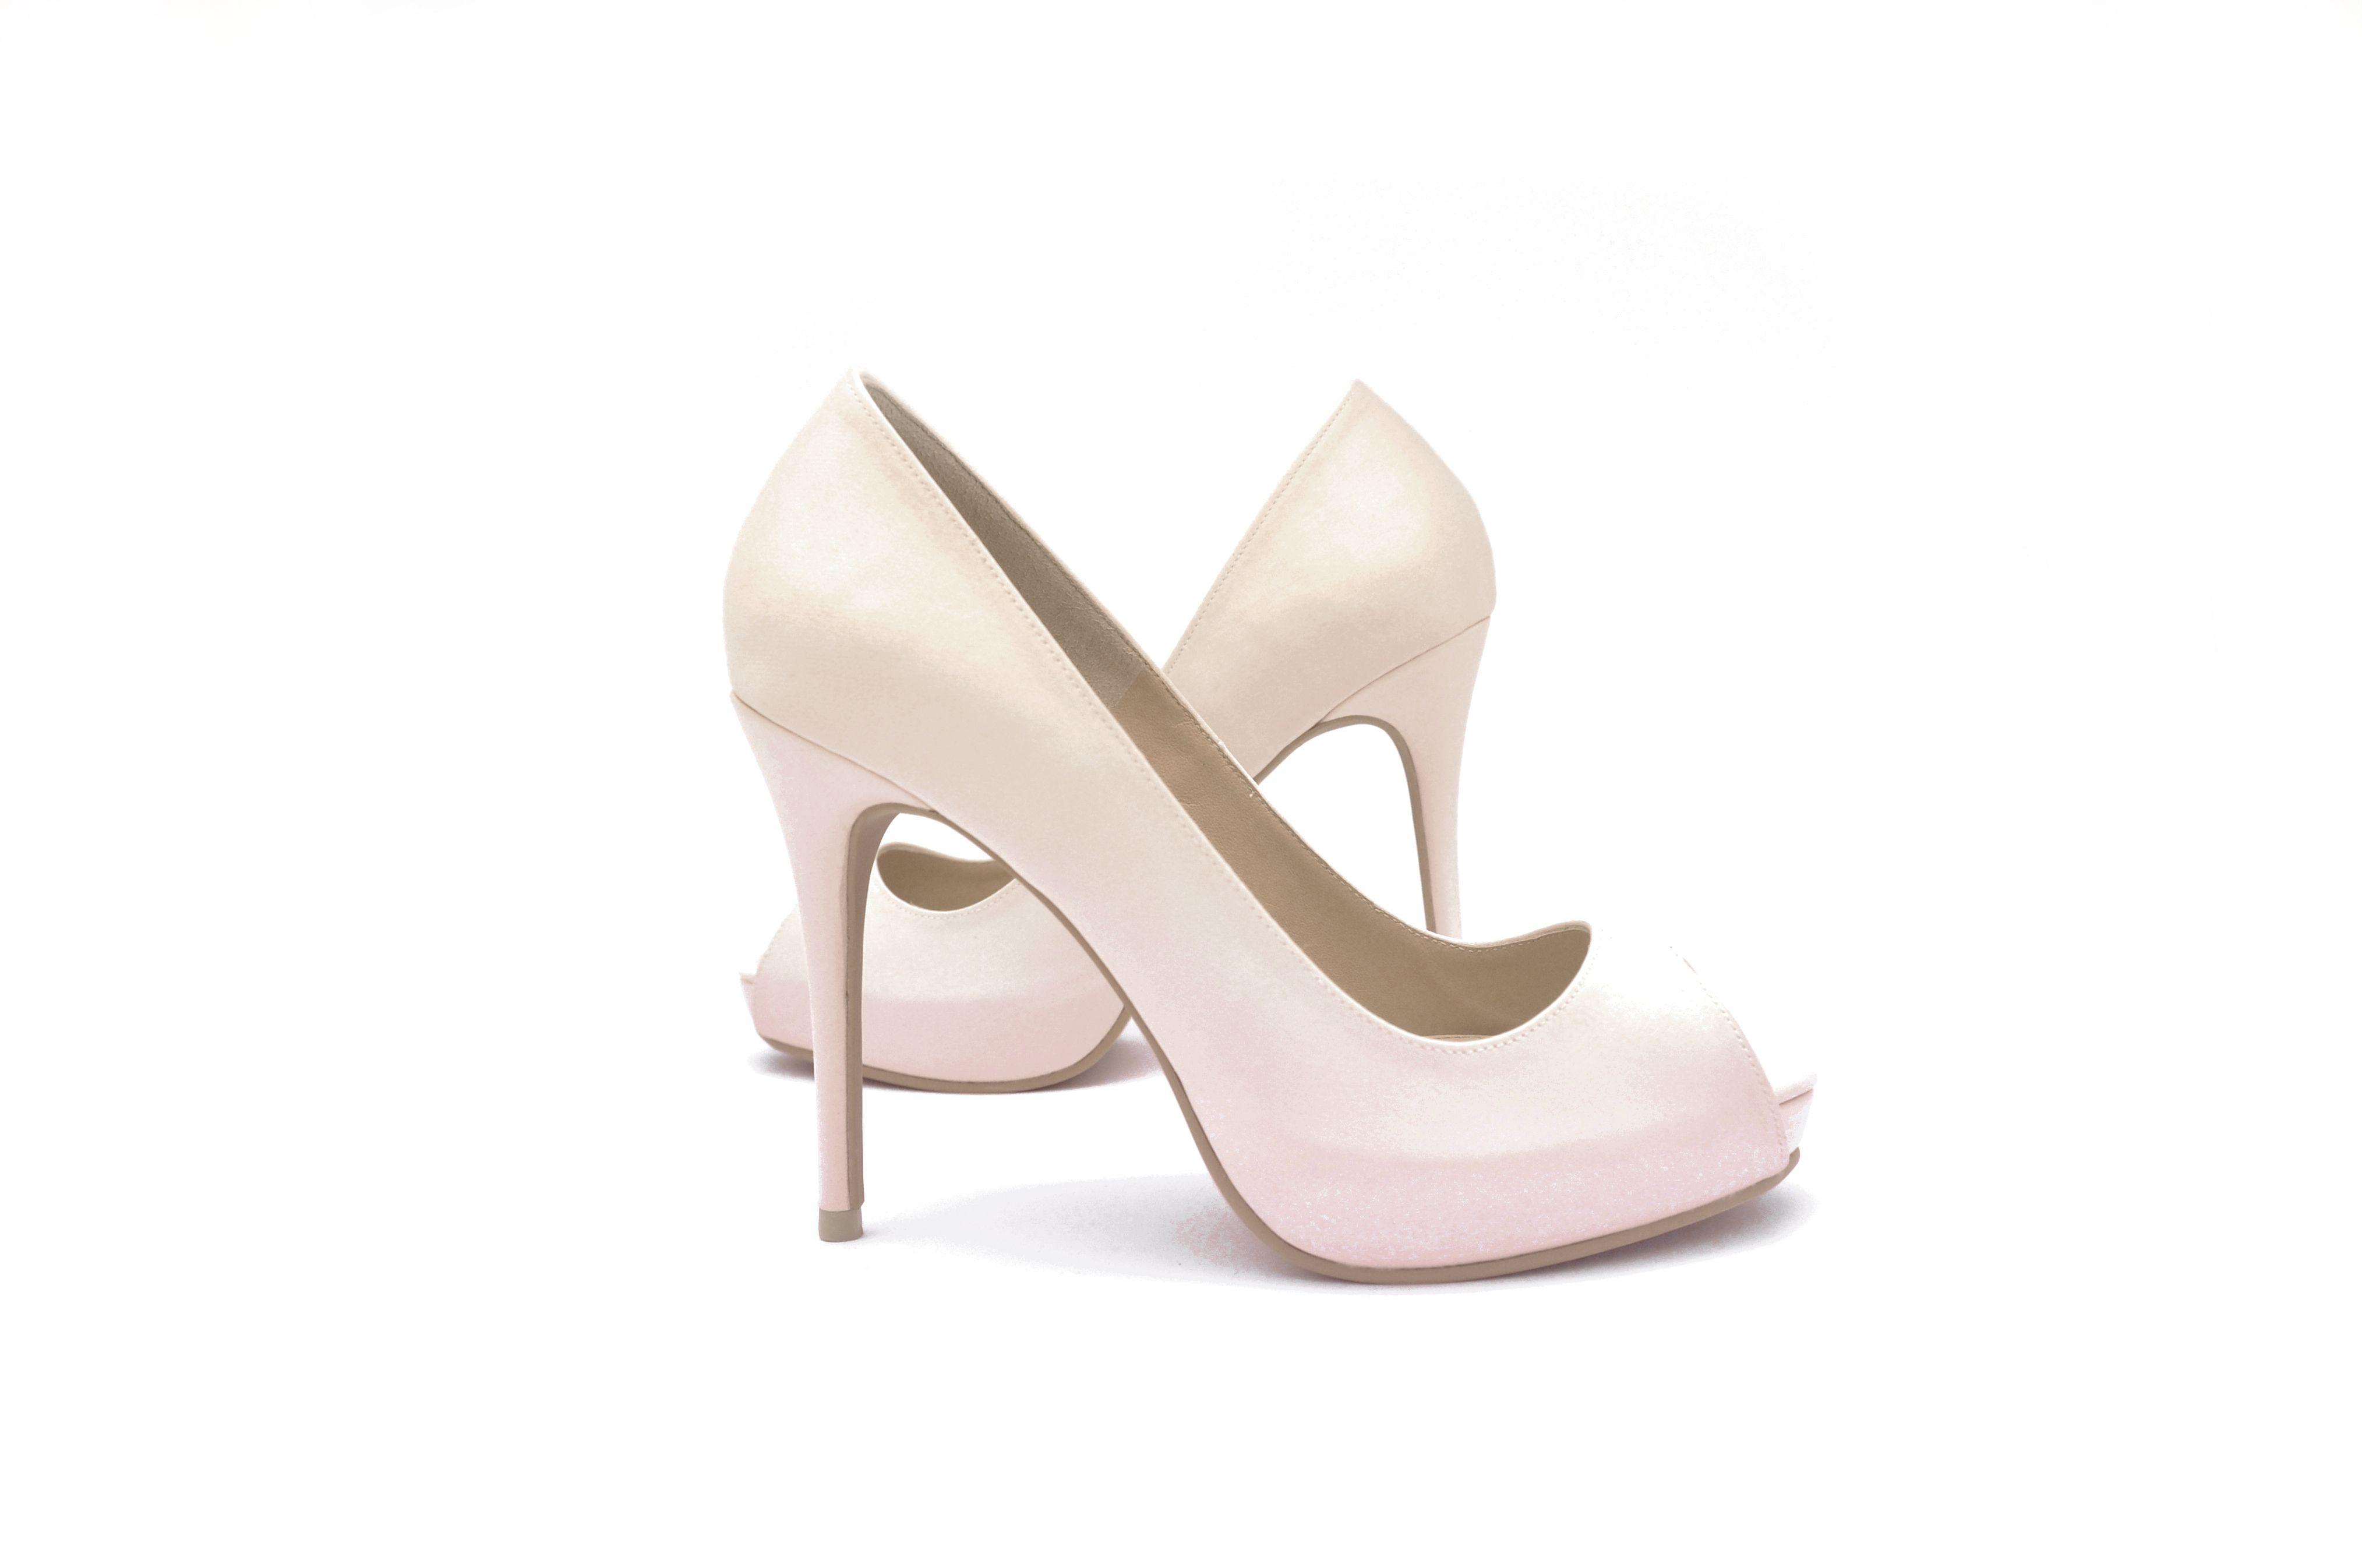 Celest Thoi Bespoke Bridal Heels Plain Low Cut Peek Toes In Blush Pink Side